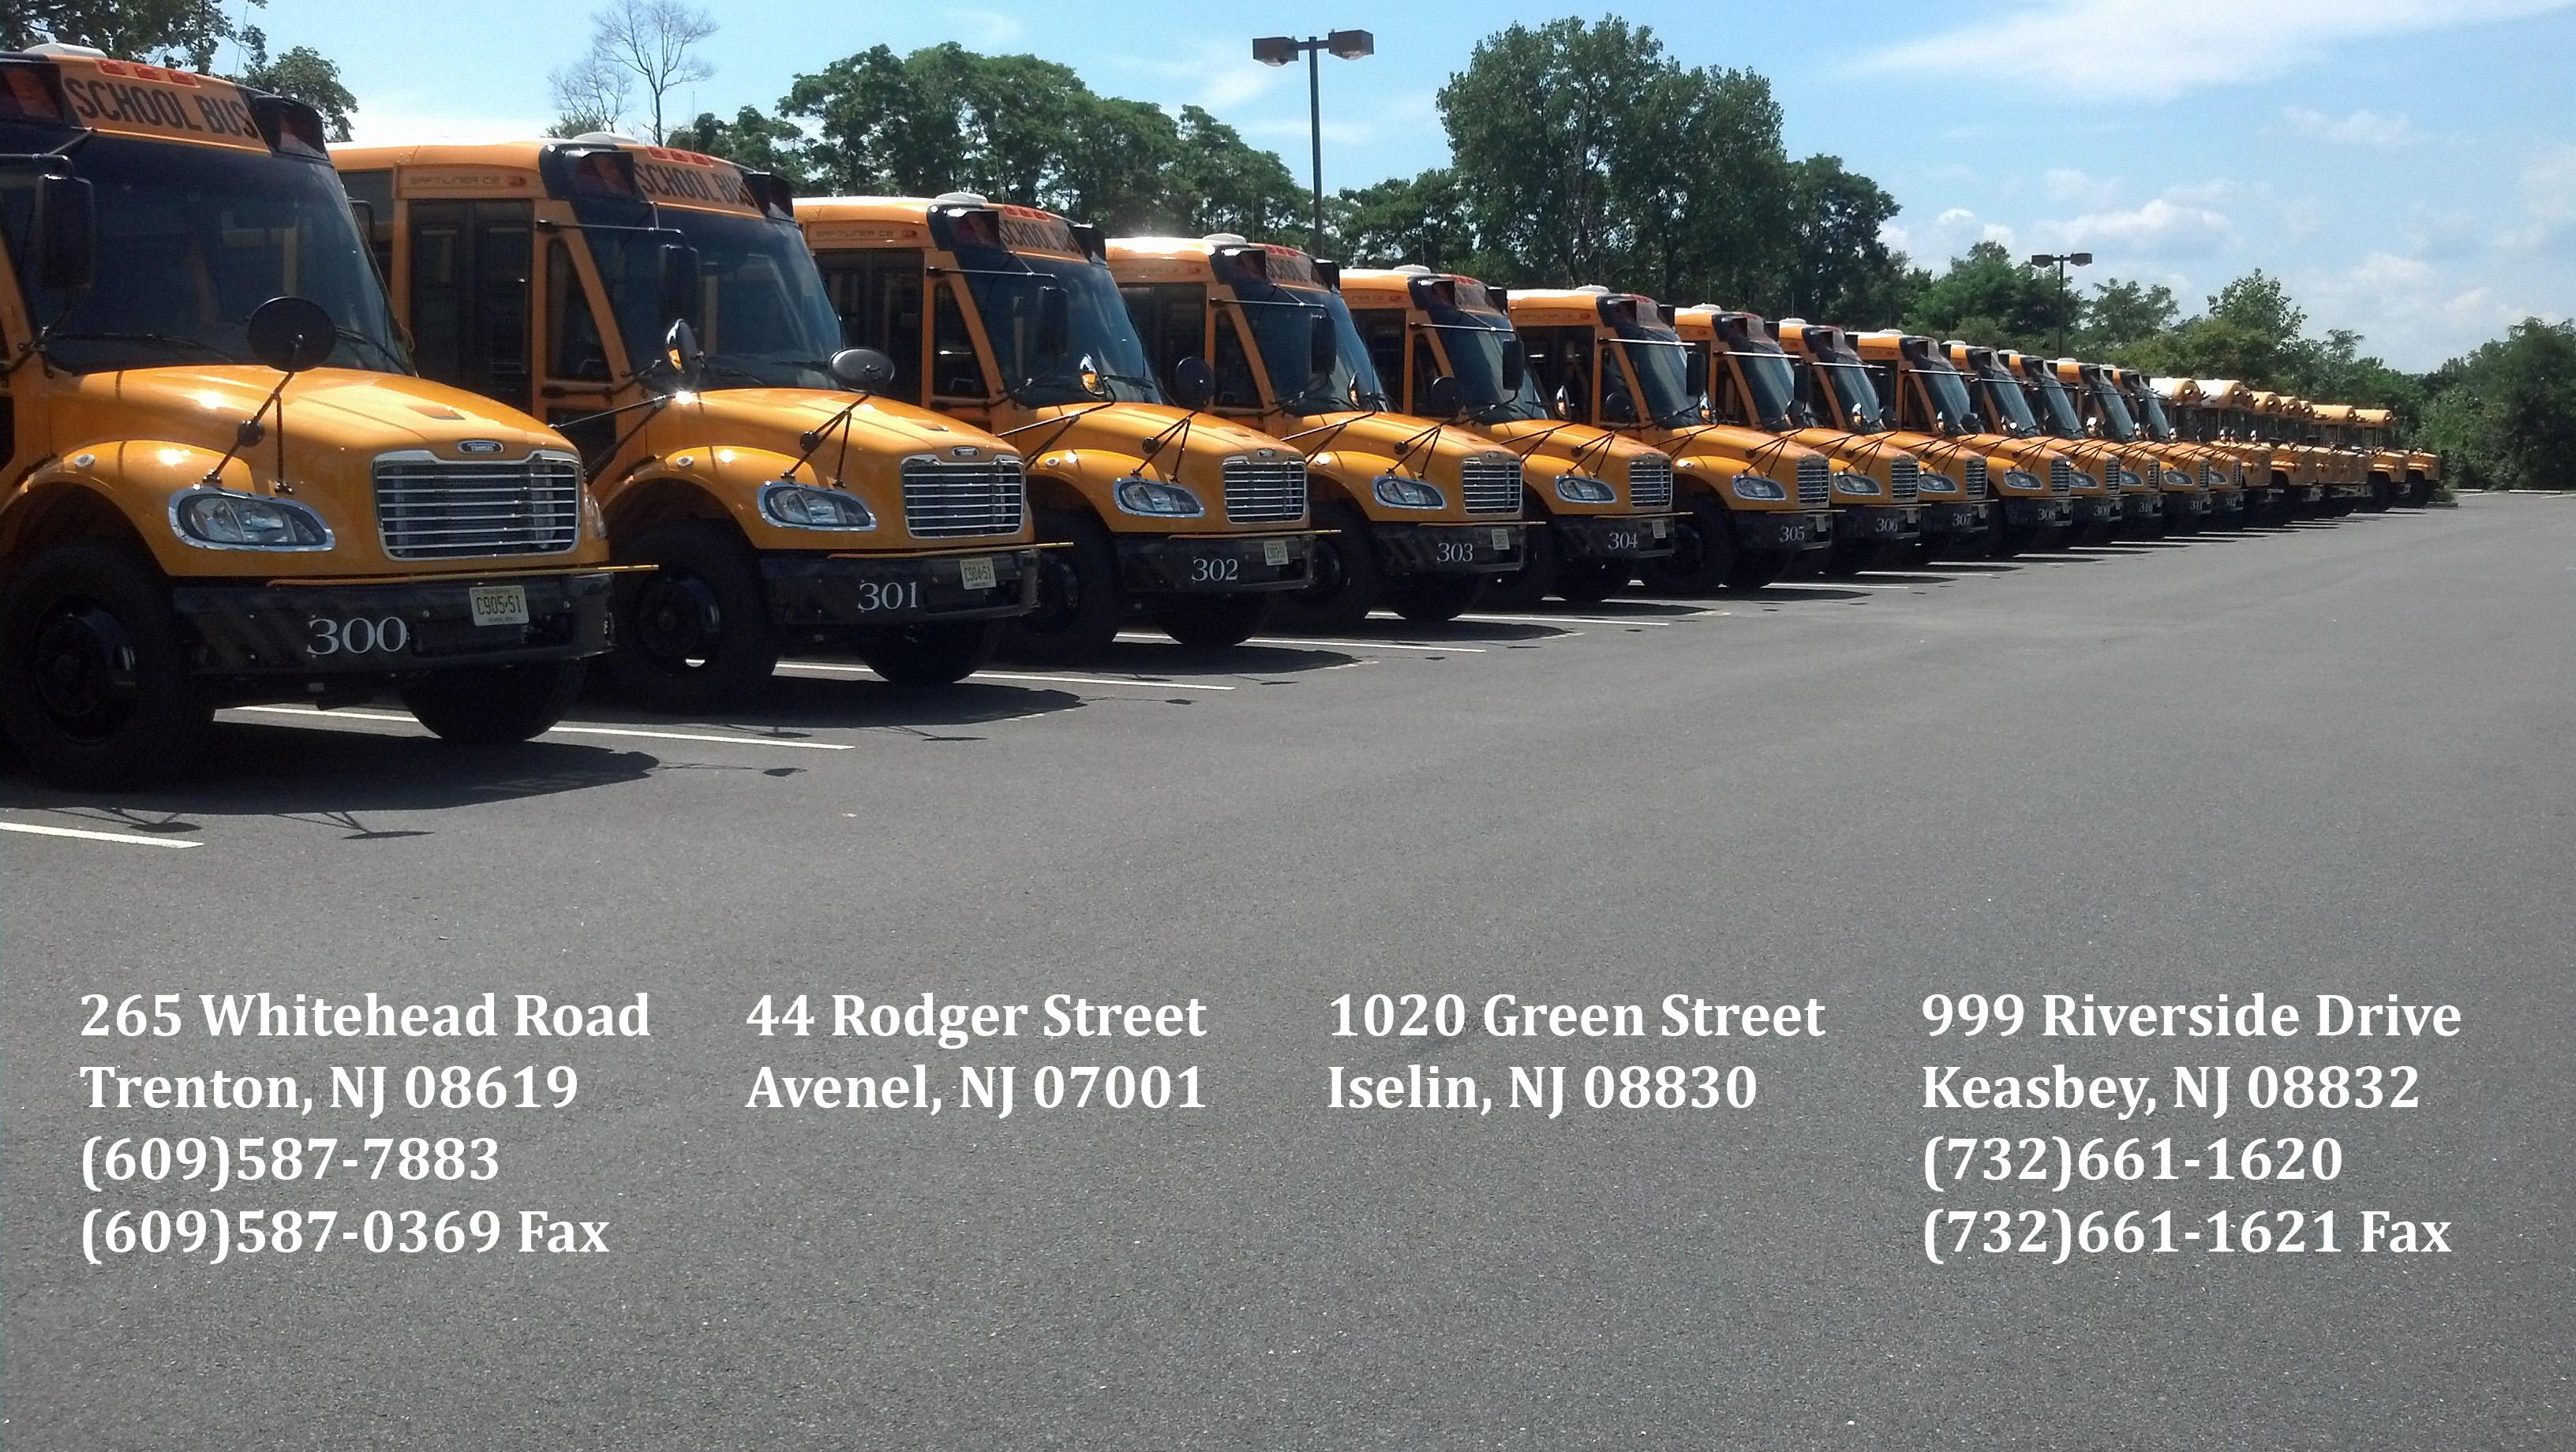 Motor vehicle locations nj for Motor vehicle in wayne nj hours